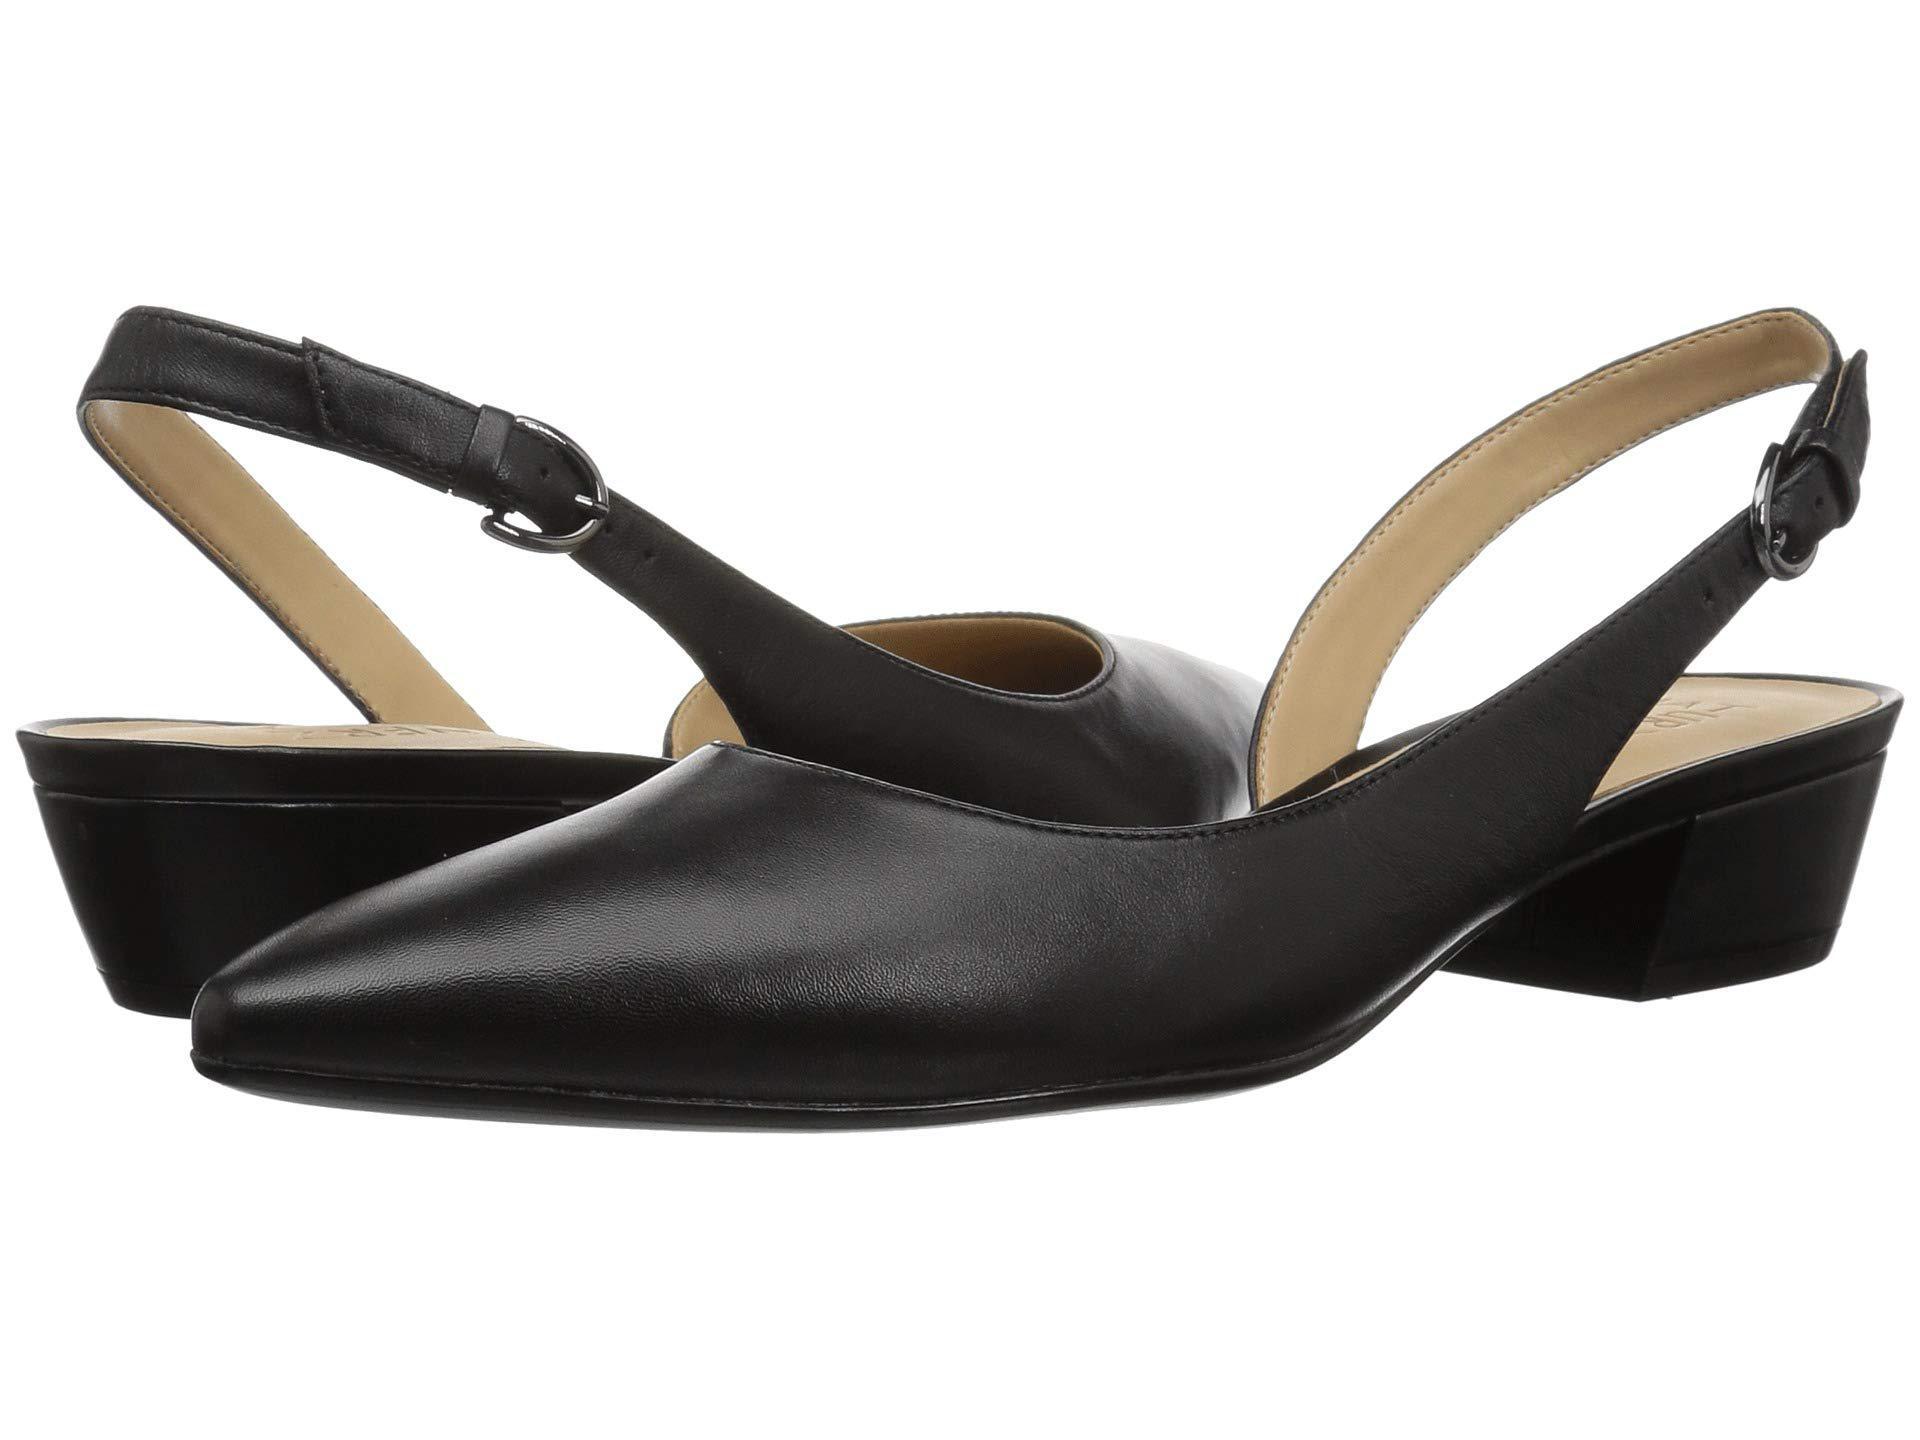 963a66484c8 Lyst - Naturalizer Banks Slingback Sandals in Black - Save 1%